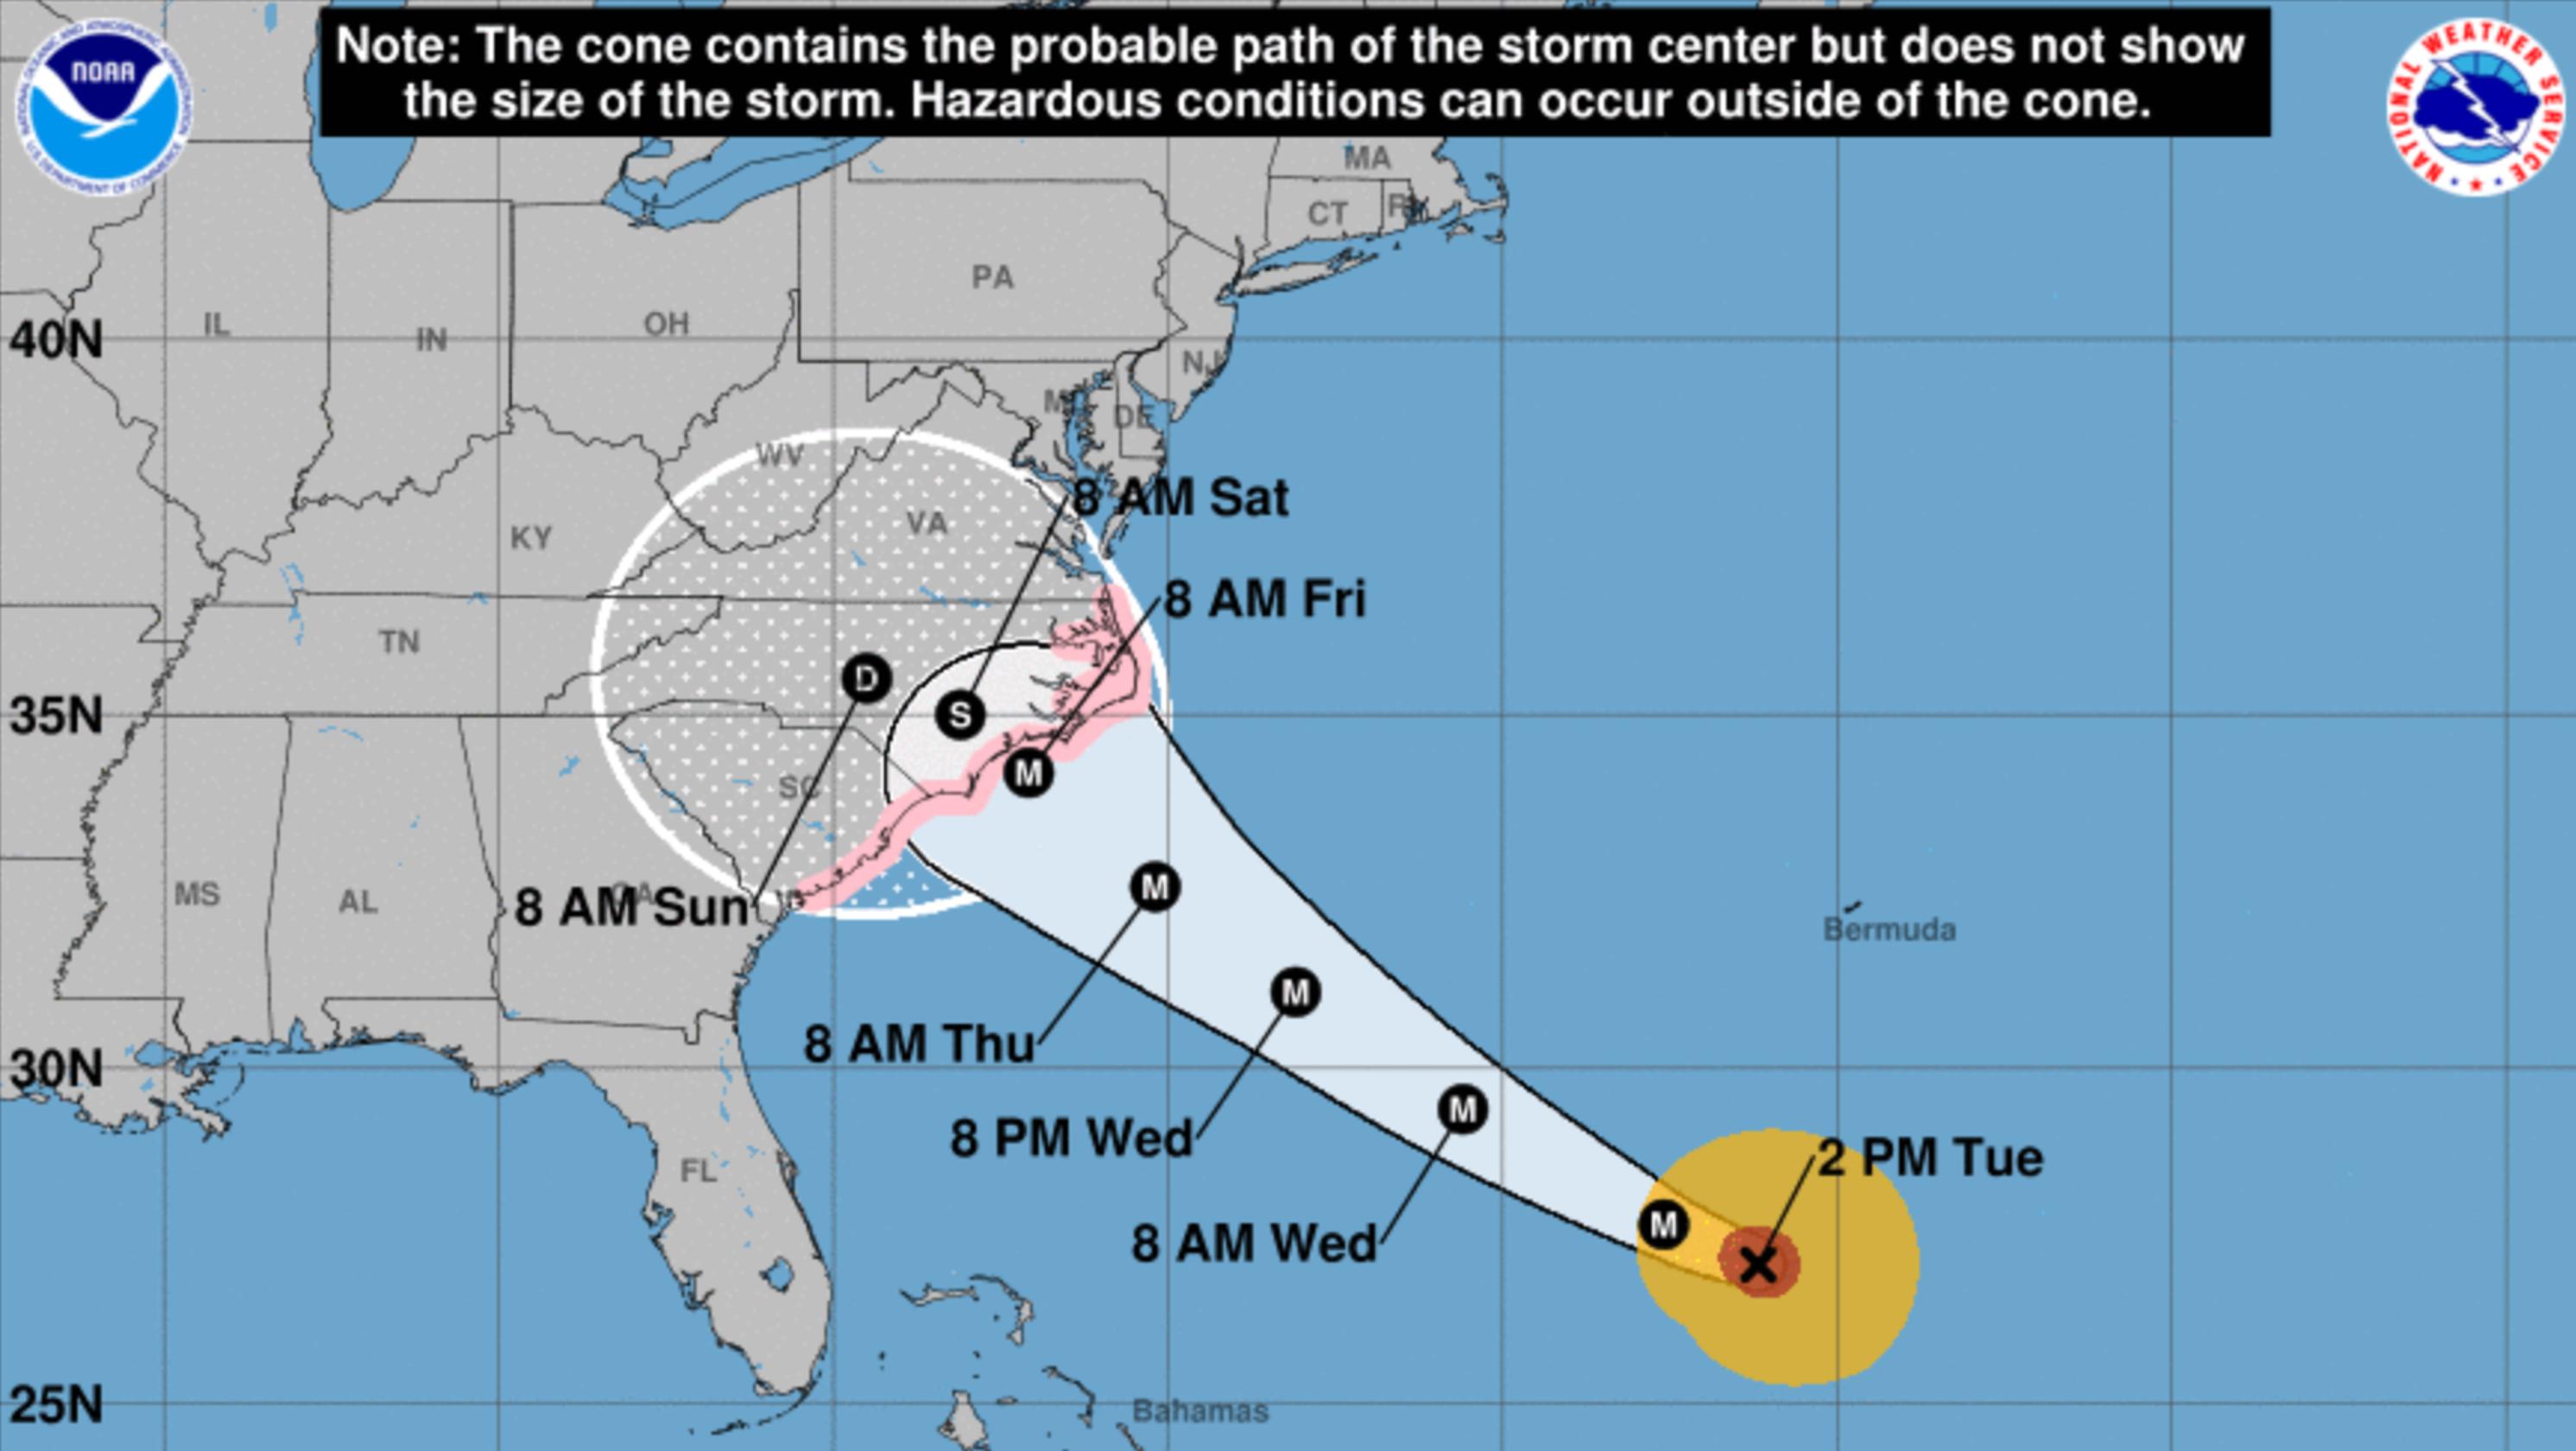 Hurricane Florence: Hurricane watch issued for Carolina coast on